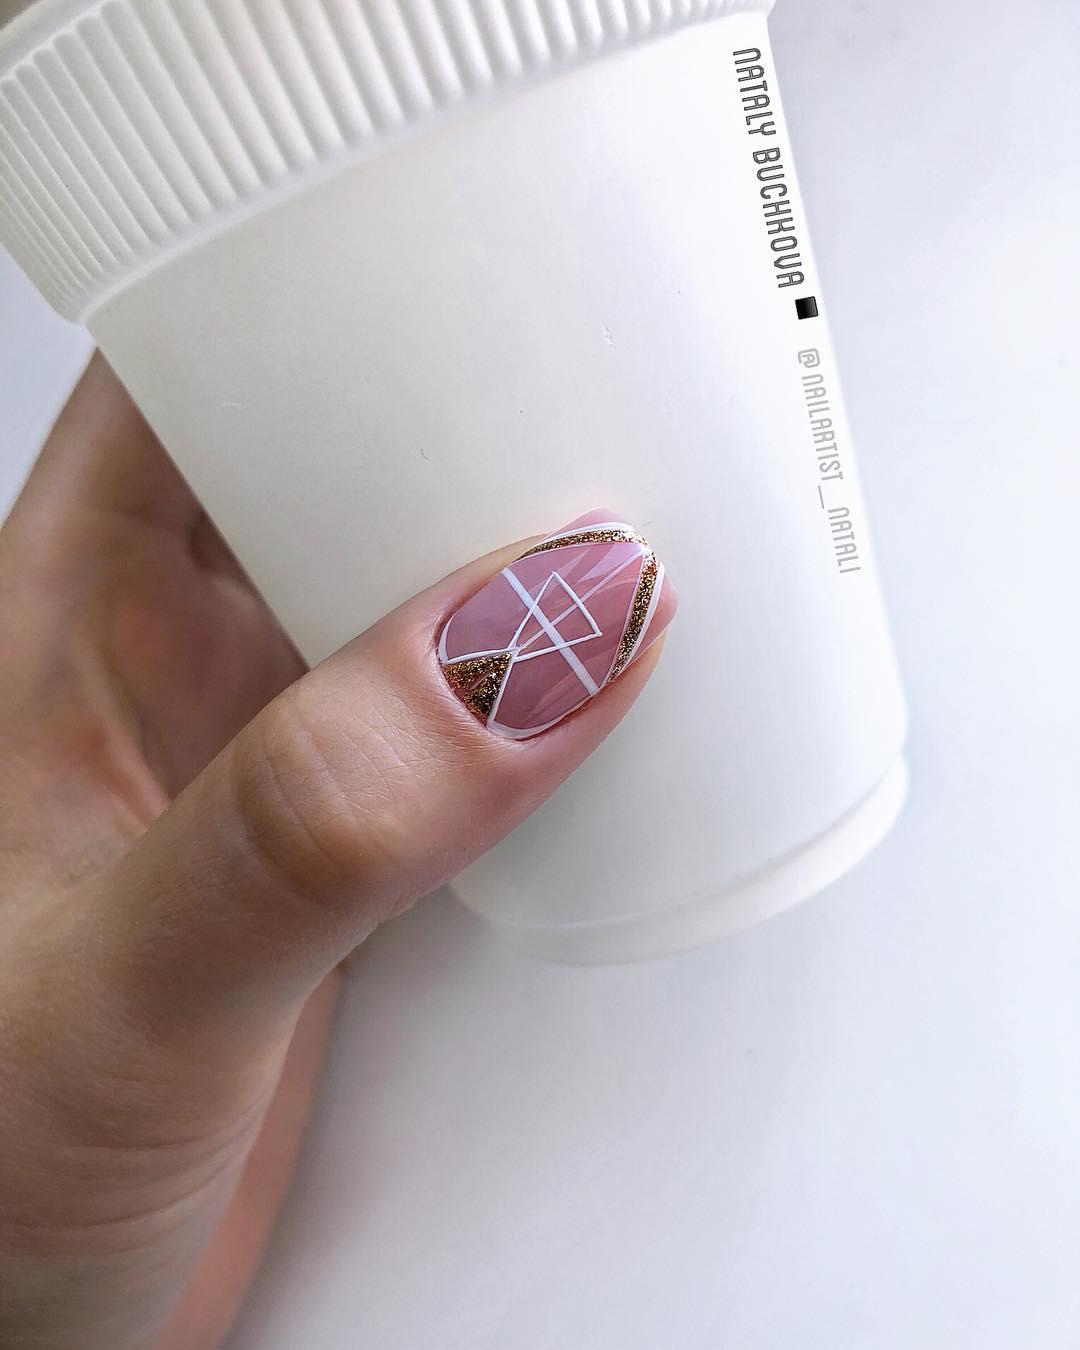 Французский маникюр на короткие ногти 2019-2020 фото идеи_14